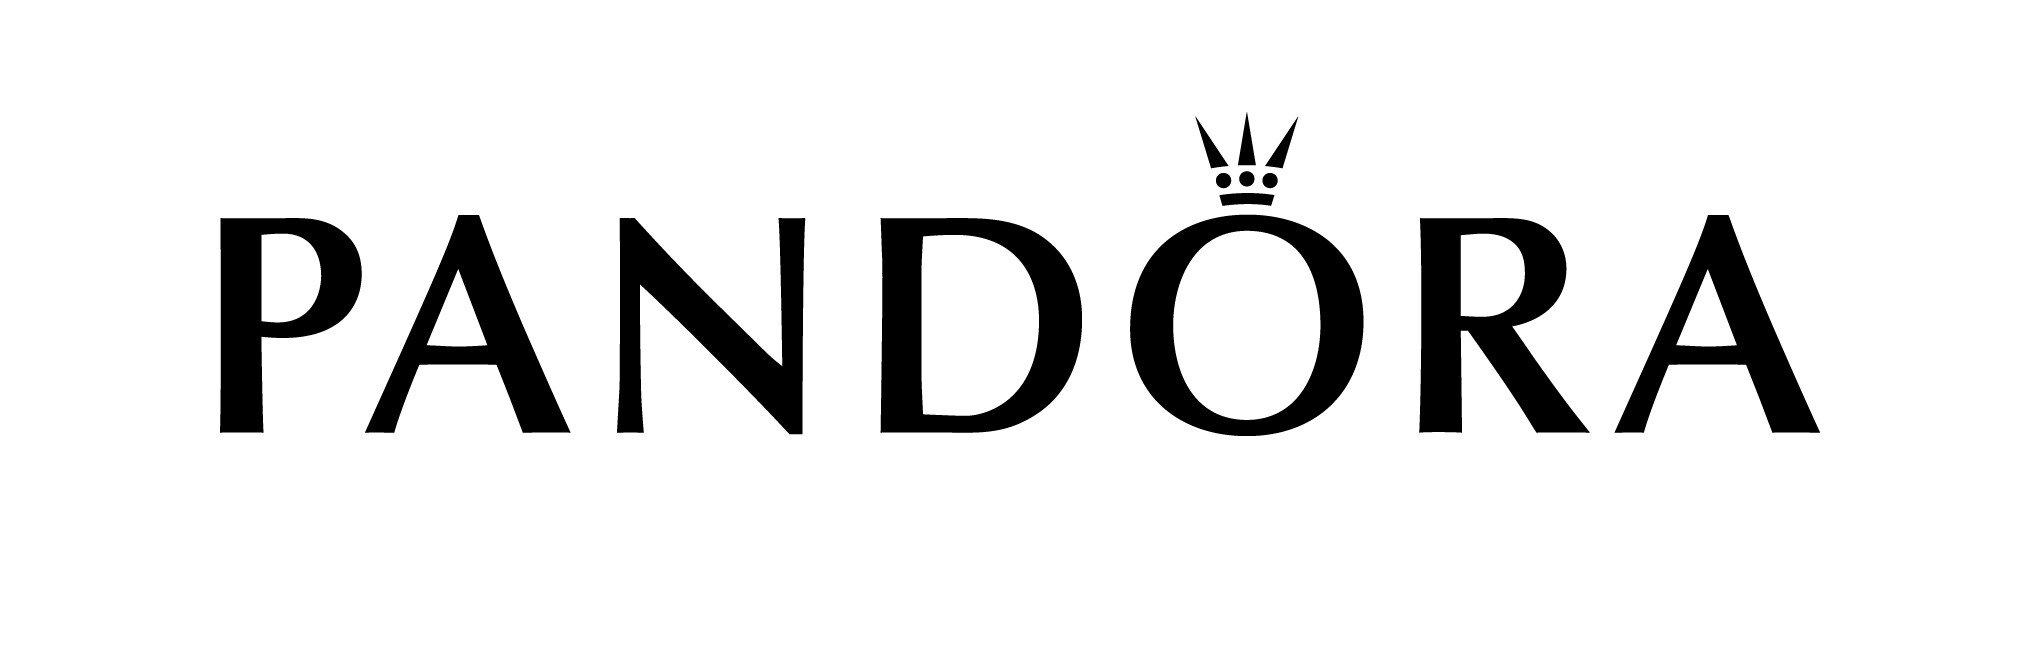 Pl Pandora Logo